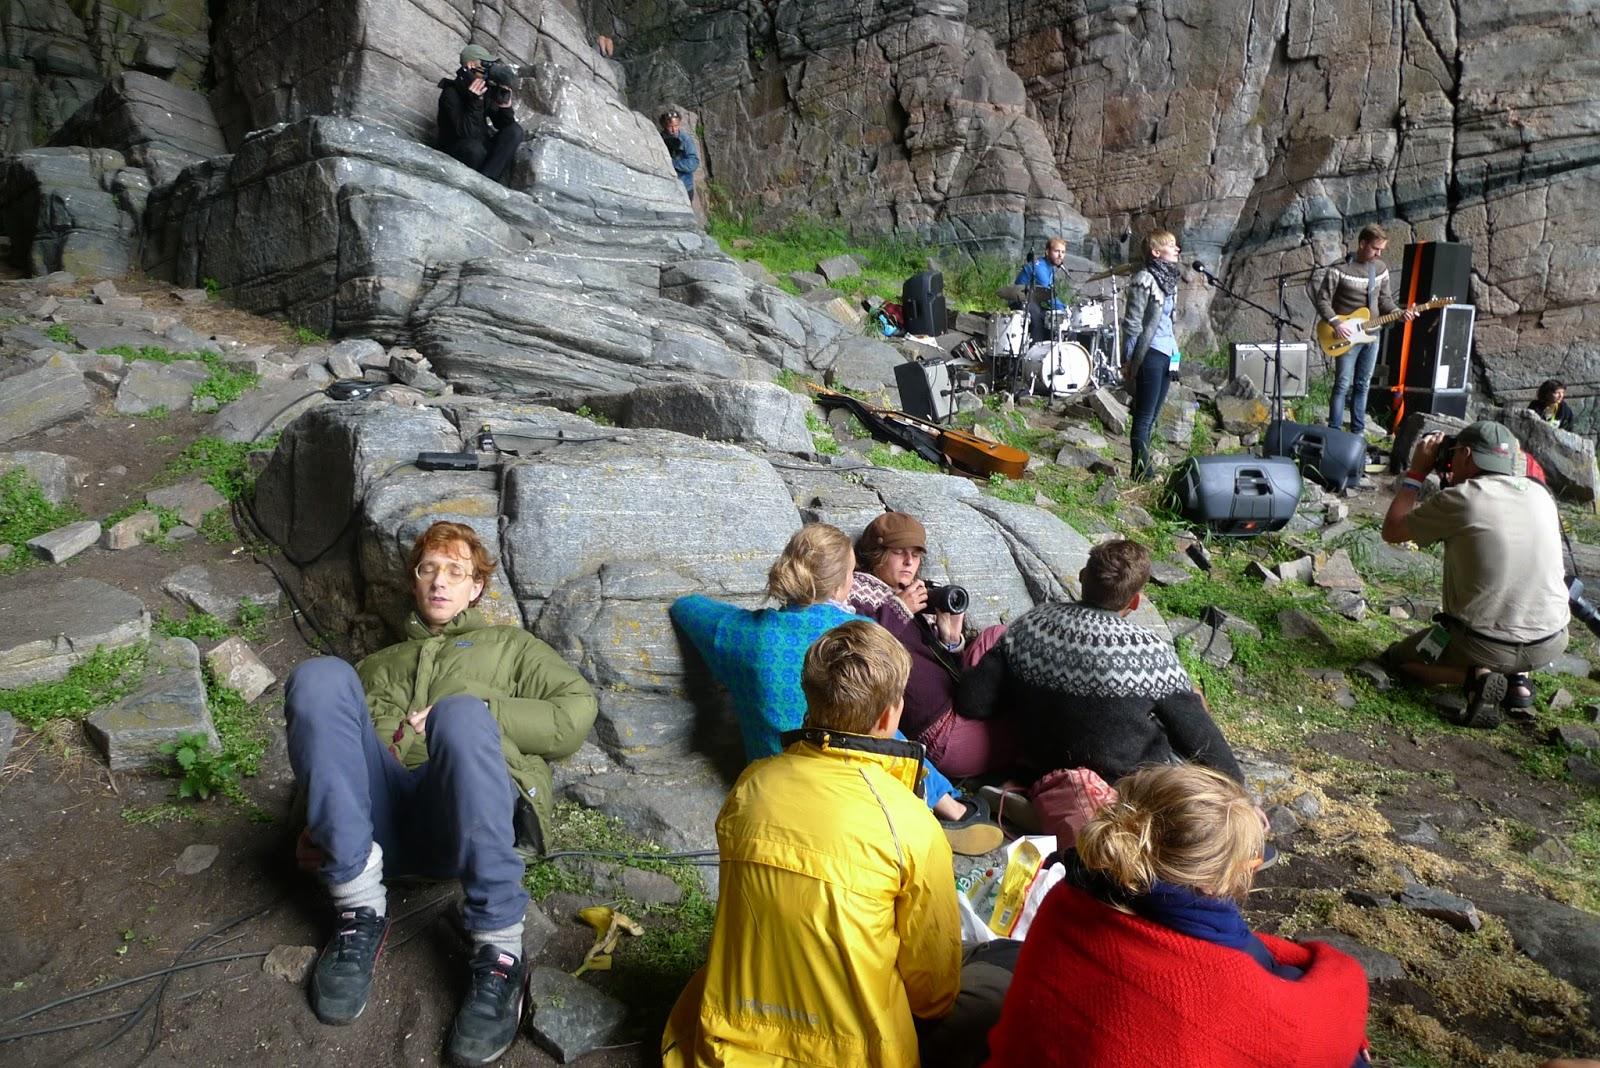 Traena festival report 2011, part 7: Samstag mit Highlight in der ...